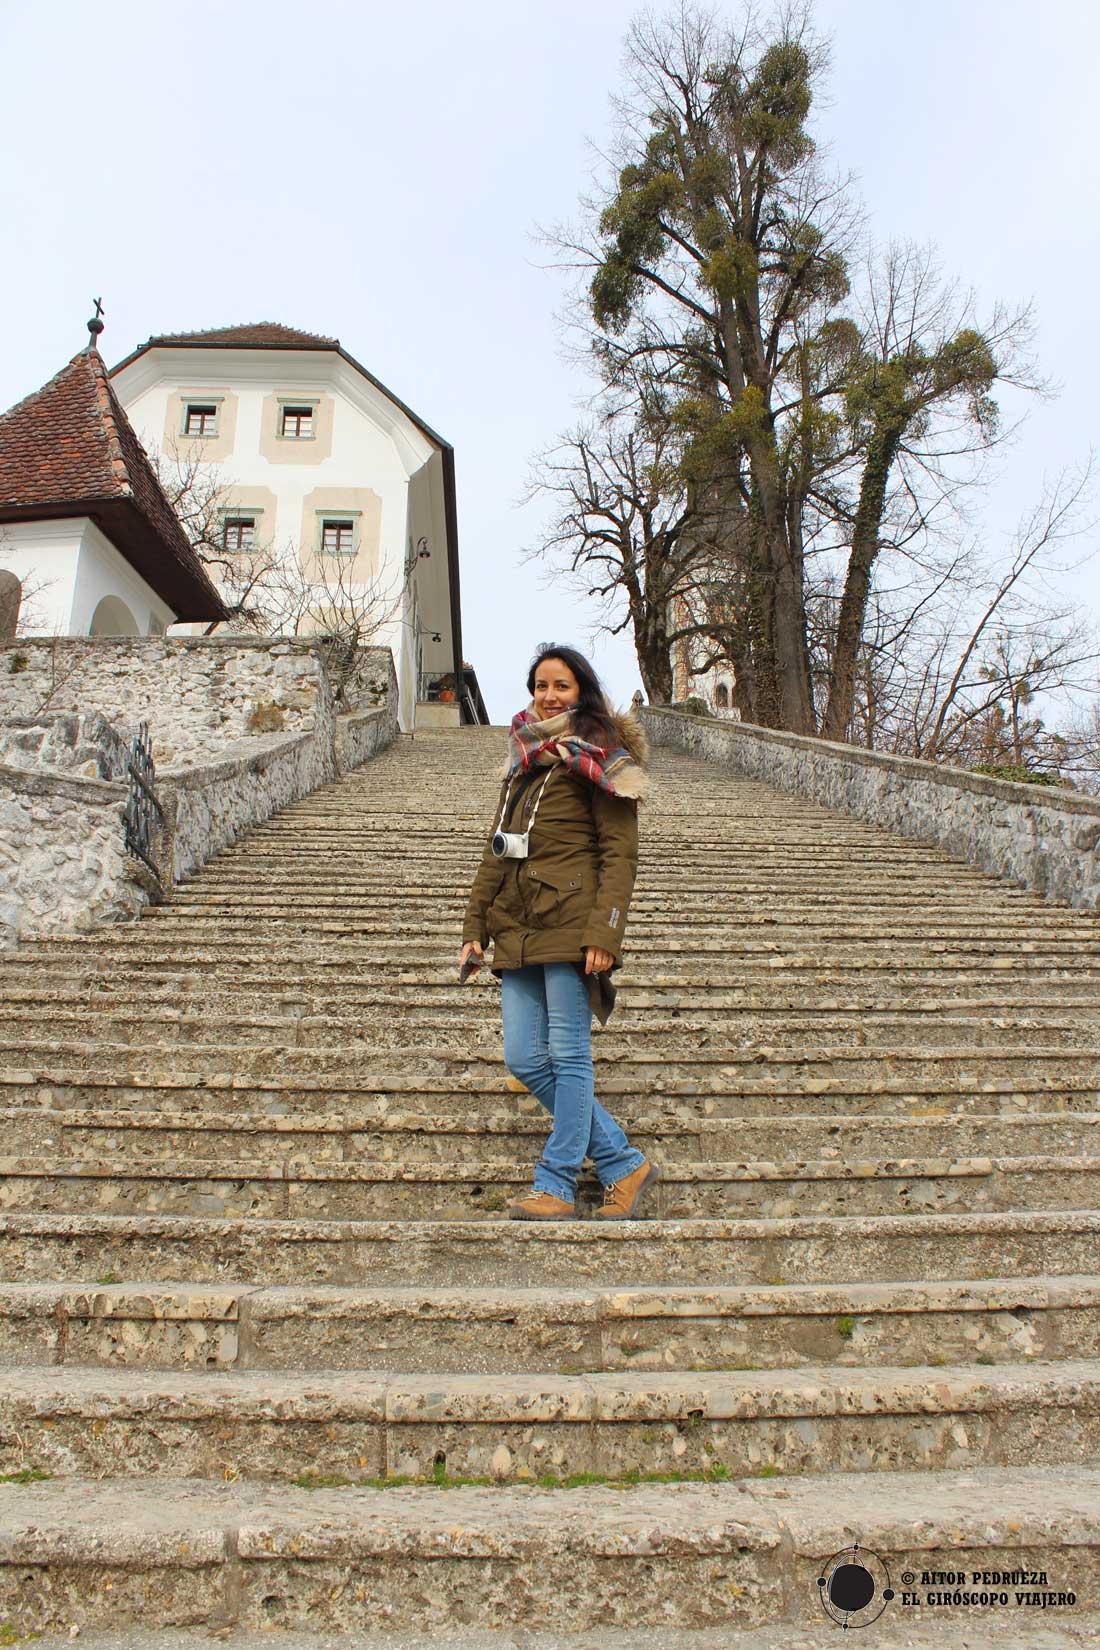 La escalera que sube en la isla de Bled hasta la iglesia